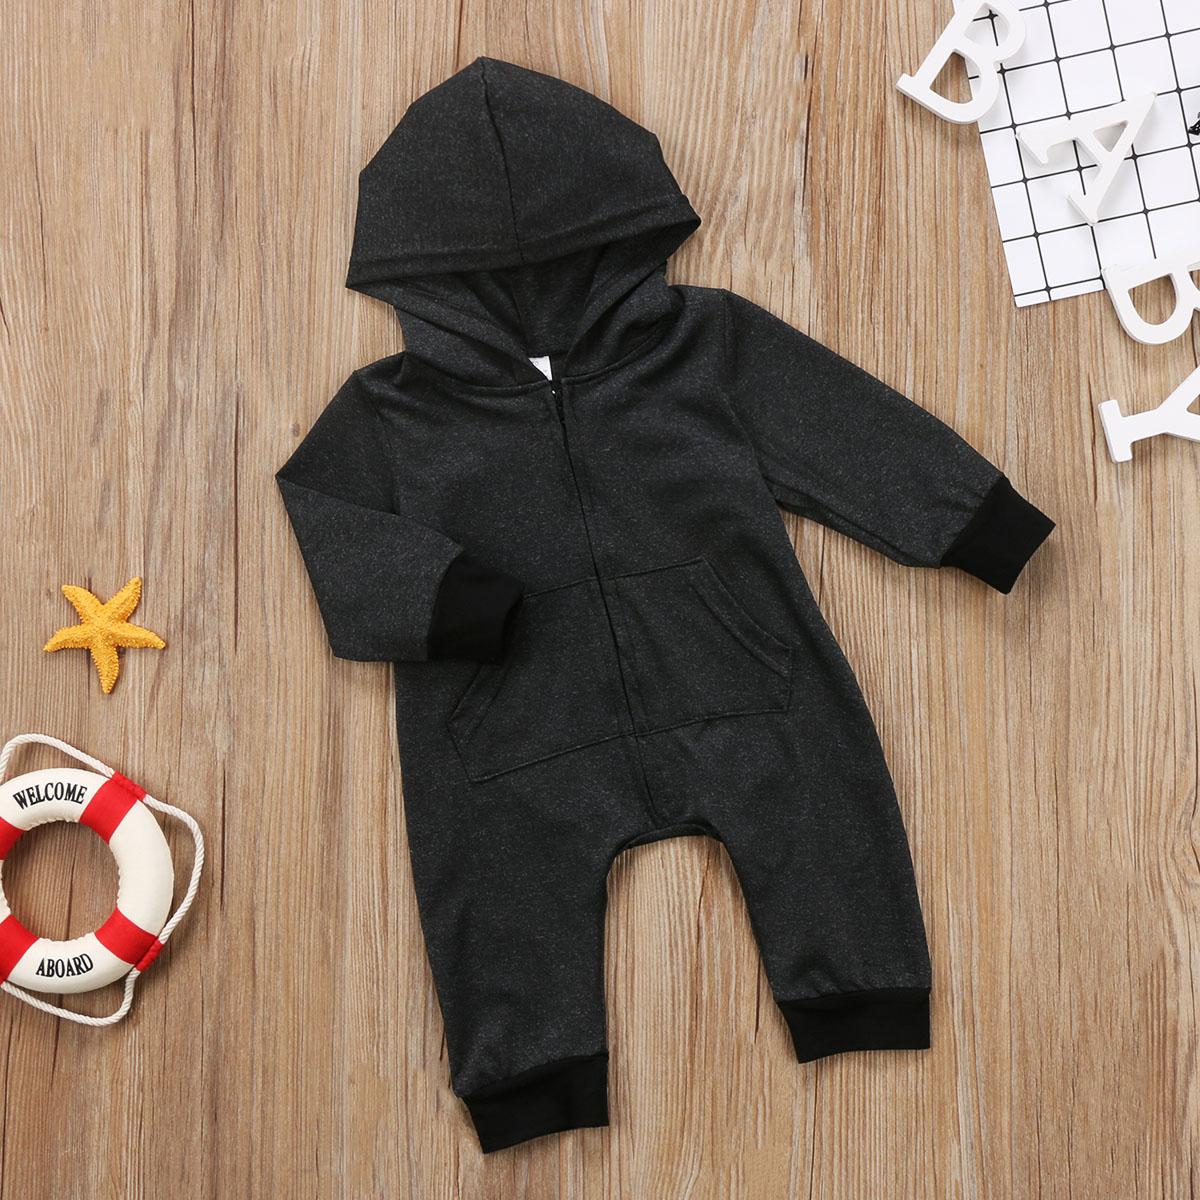 HTB1ue9eAgKTBuNkSne1q6yJoXXaD 2019 Newborn Kids Baby Boy Baby Girl Warm Infant Zipper Cotton Long Sleeve Romper Jumpsuit Hooded Clothes Sweater Outfit 0-24M